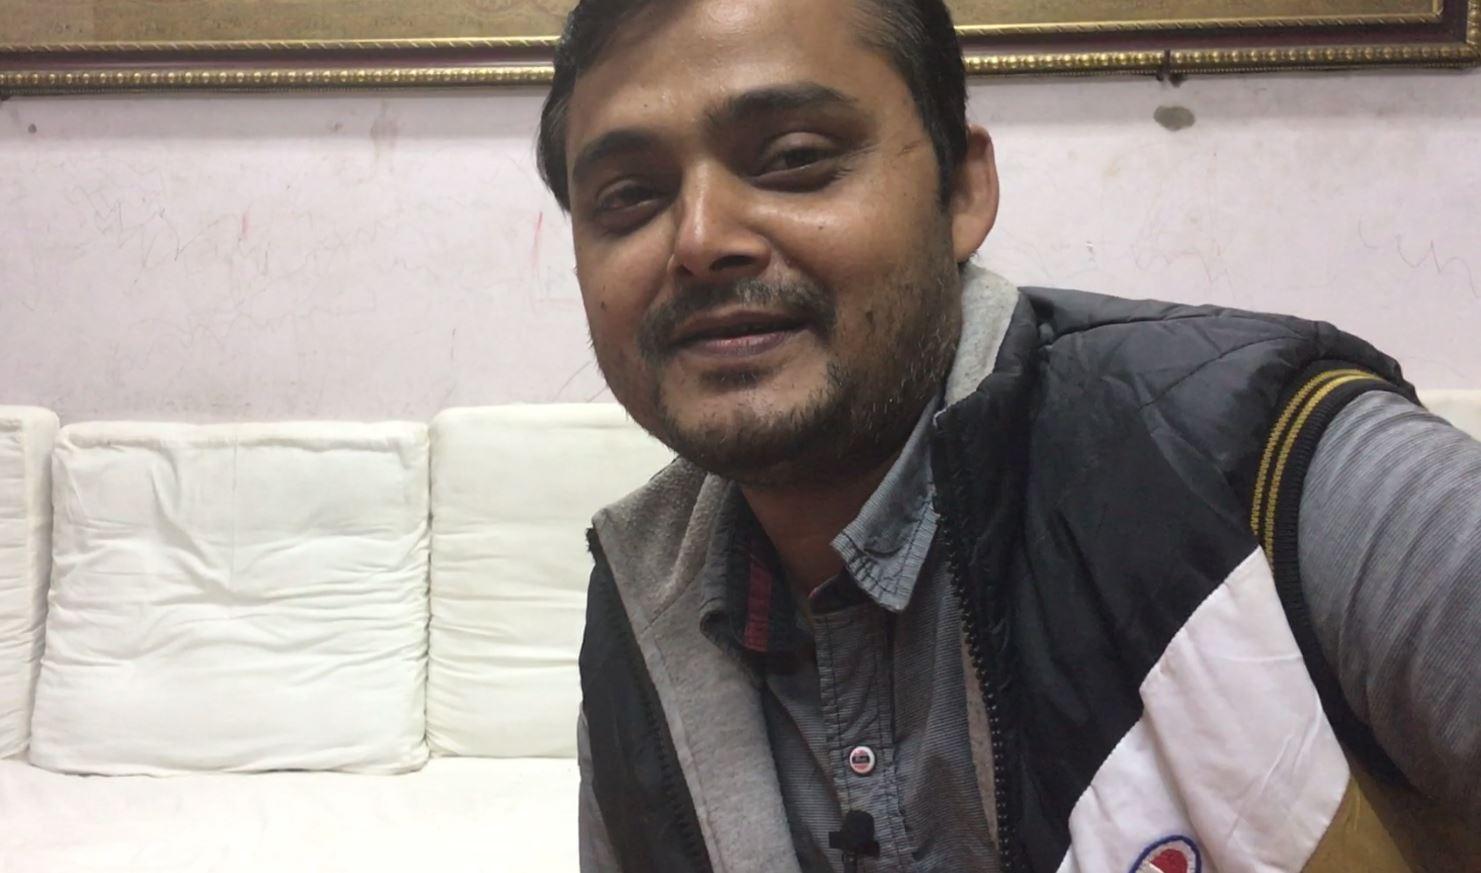 https://hindi.thequint.com/lifestyle/pop-culture/mirza-ghalib-birthday ...